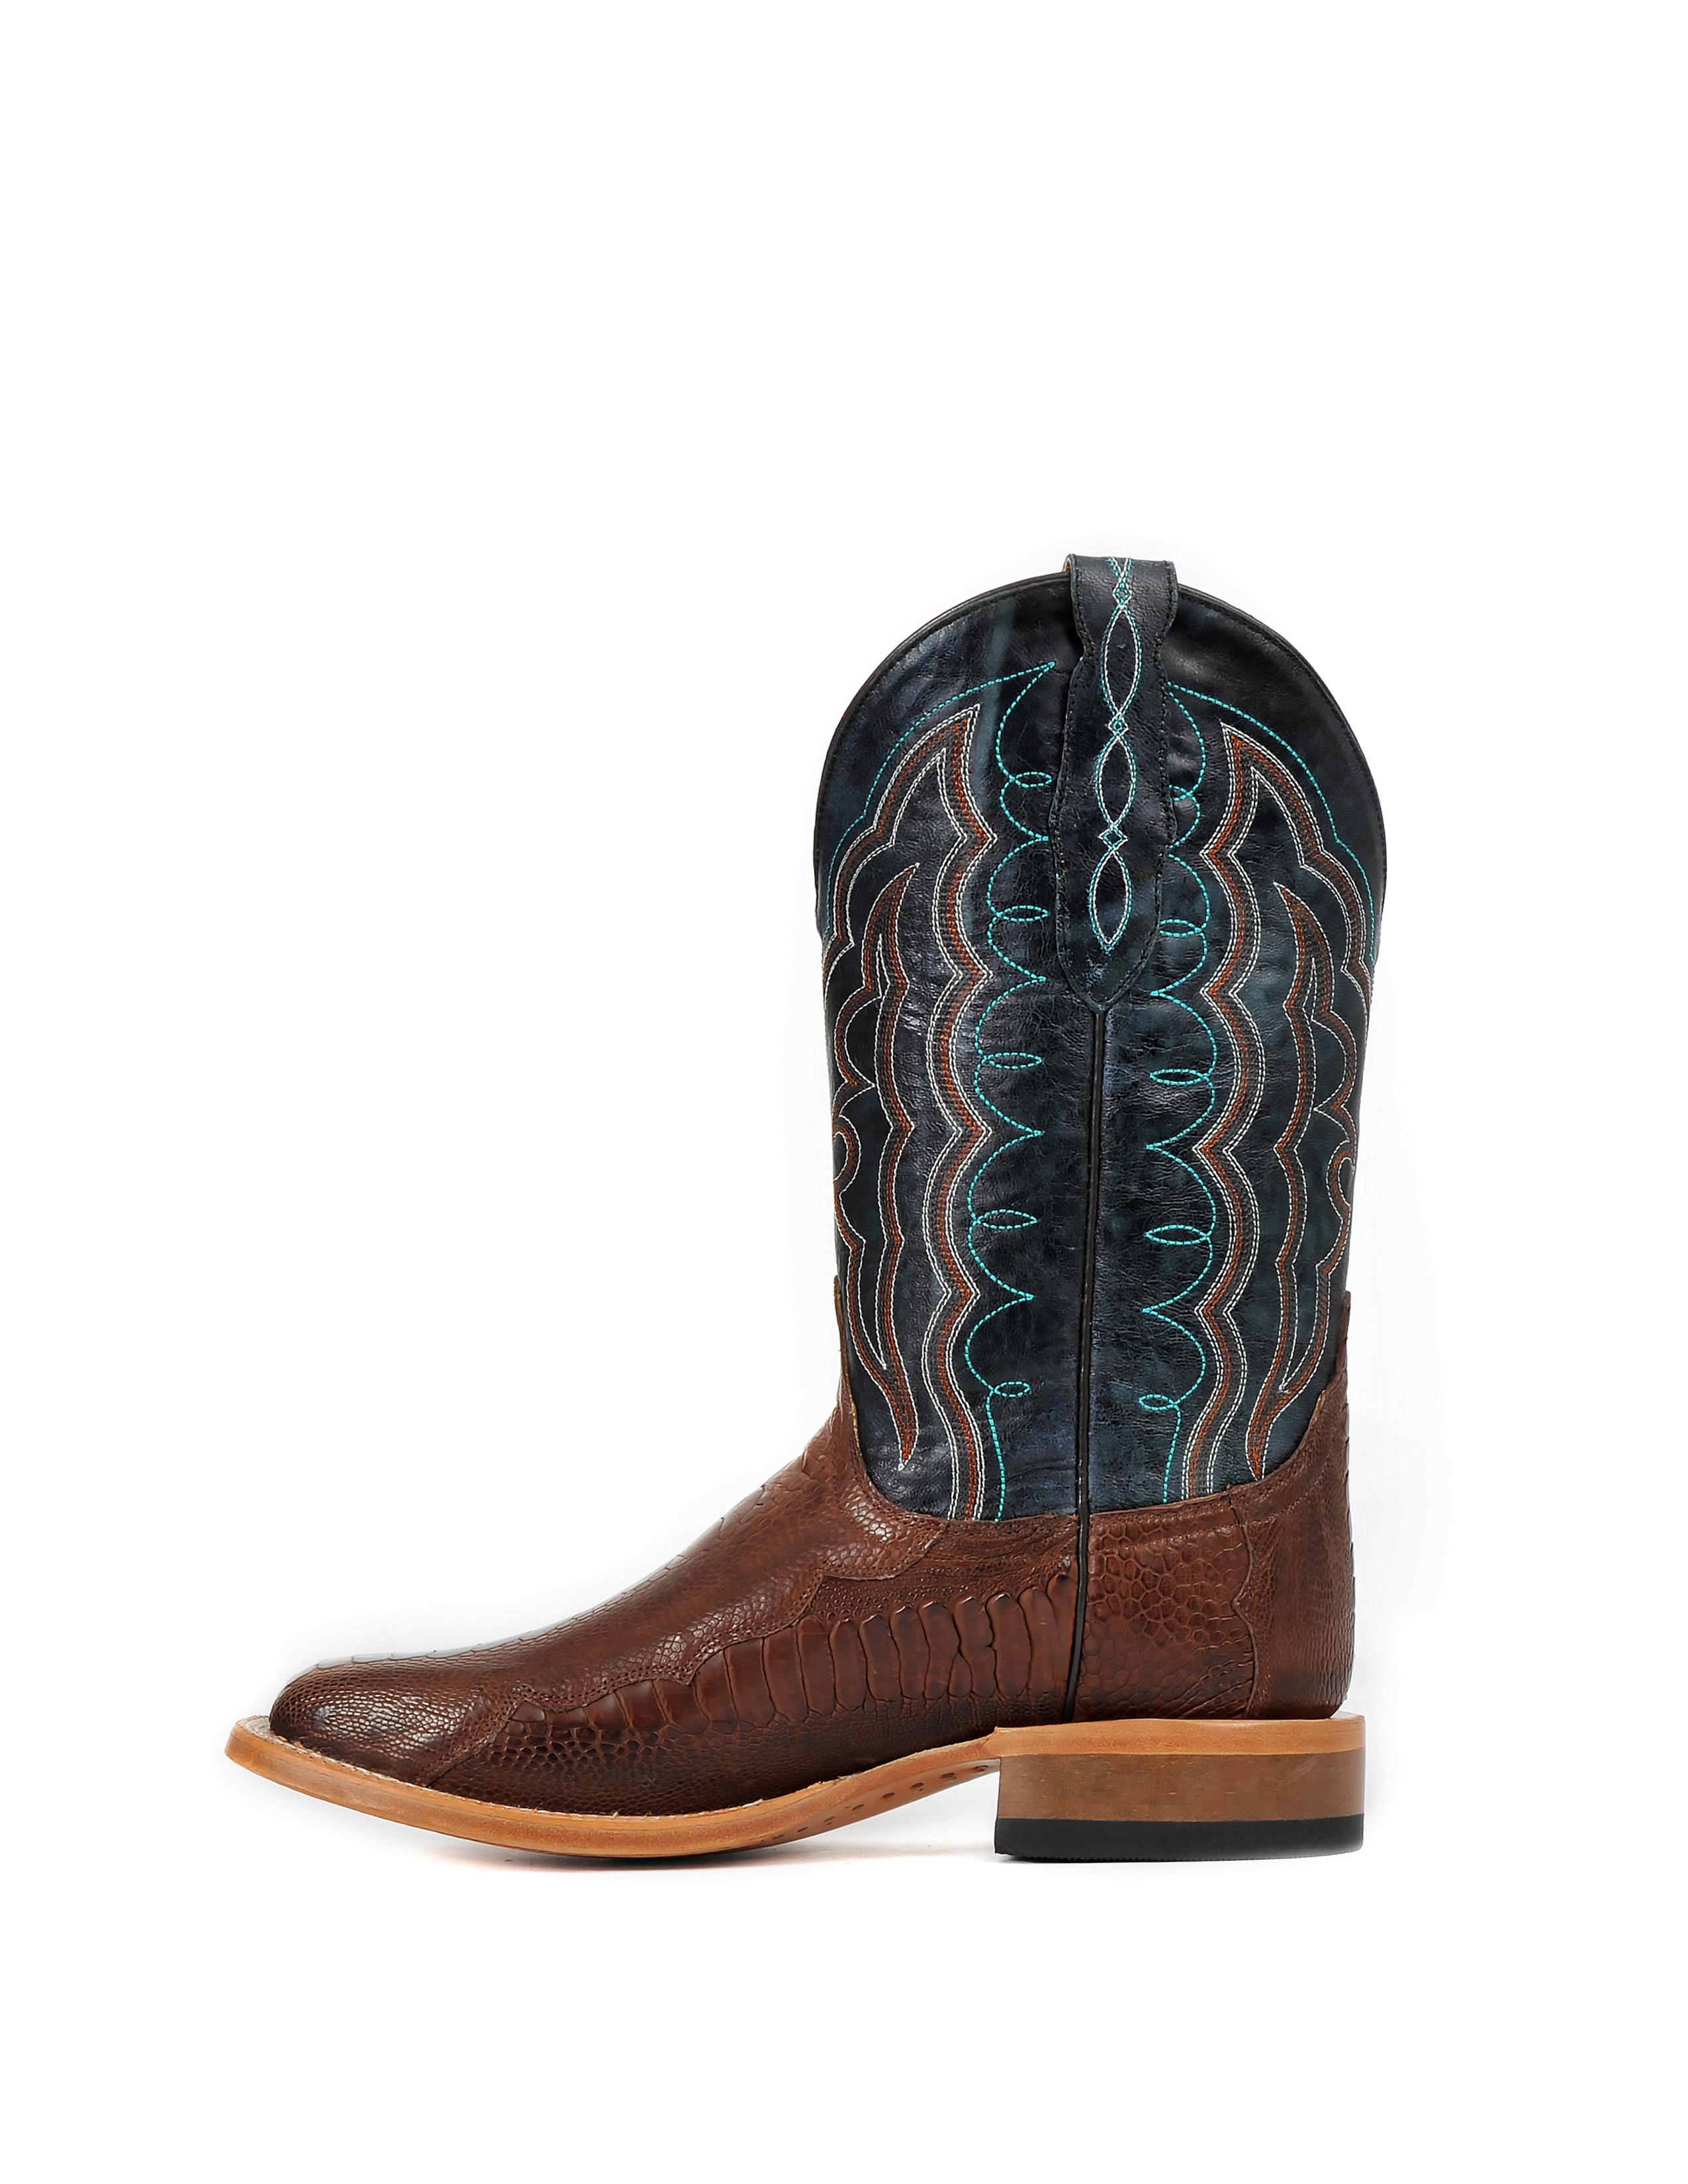 Cinch Men's Chestnut Ostrich Leg CFM538 Western Boots